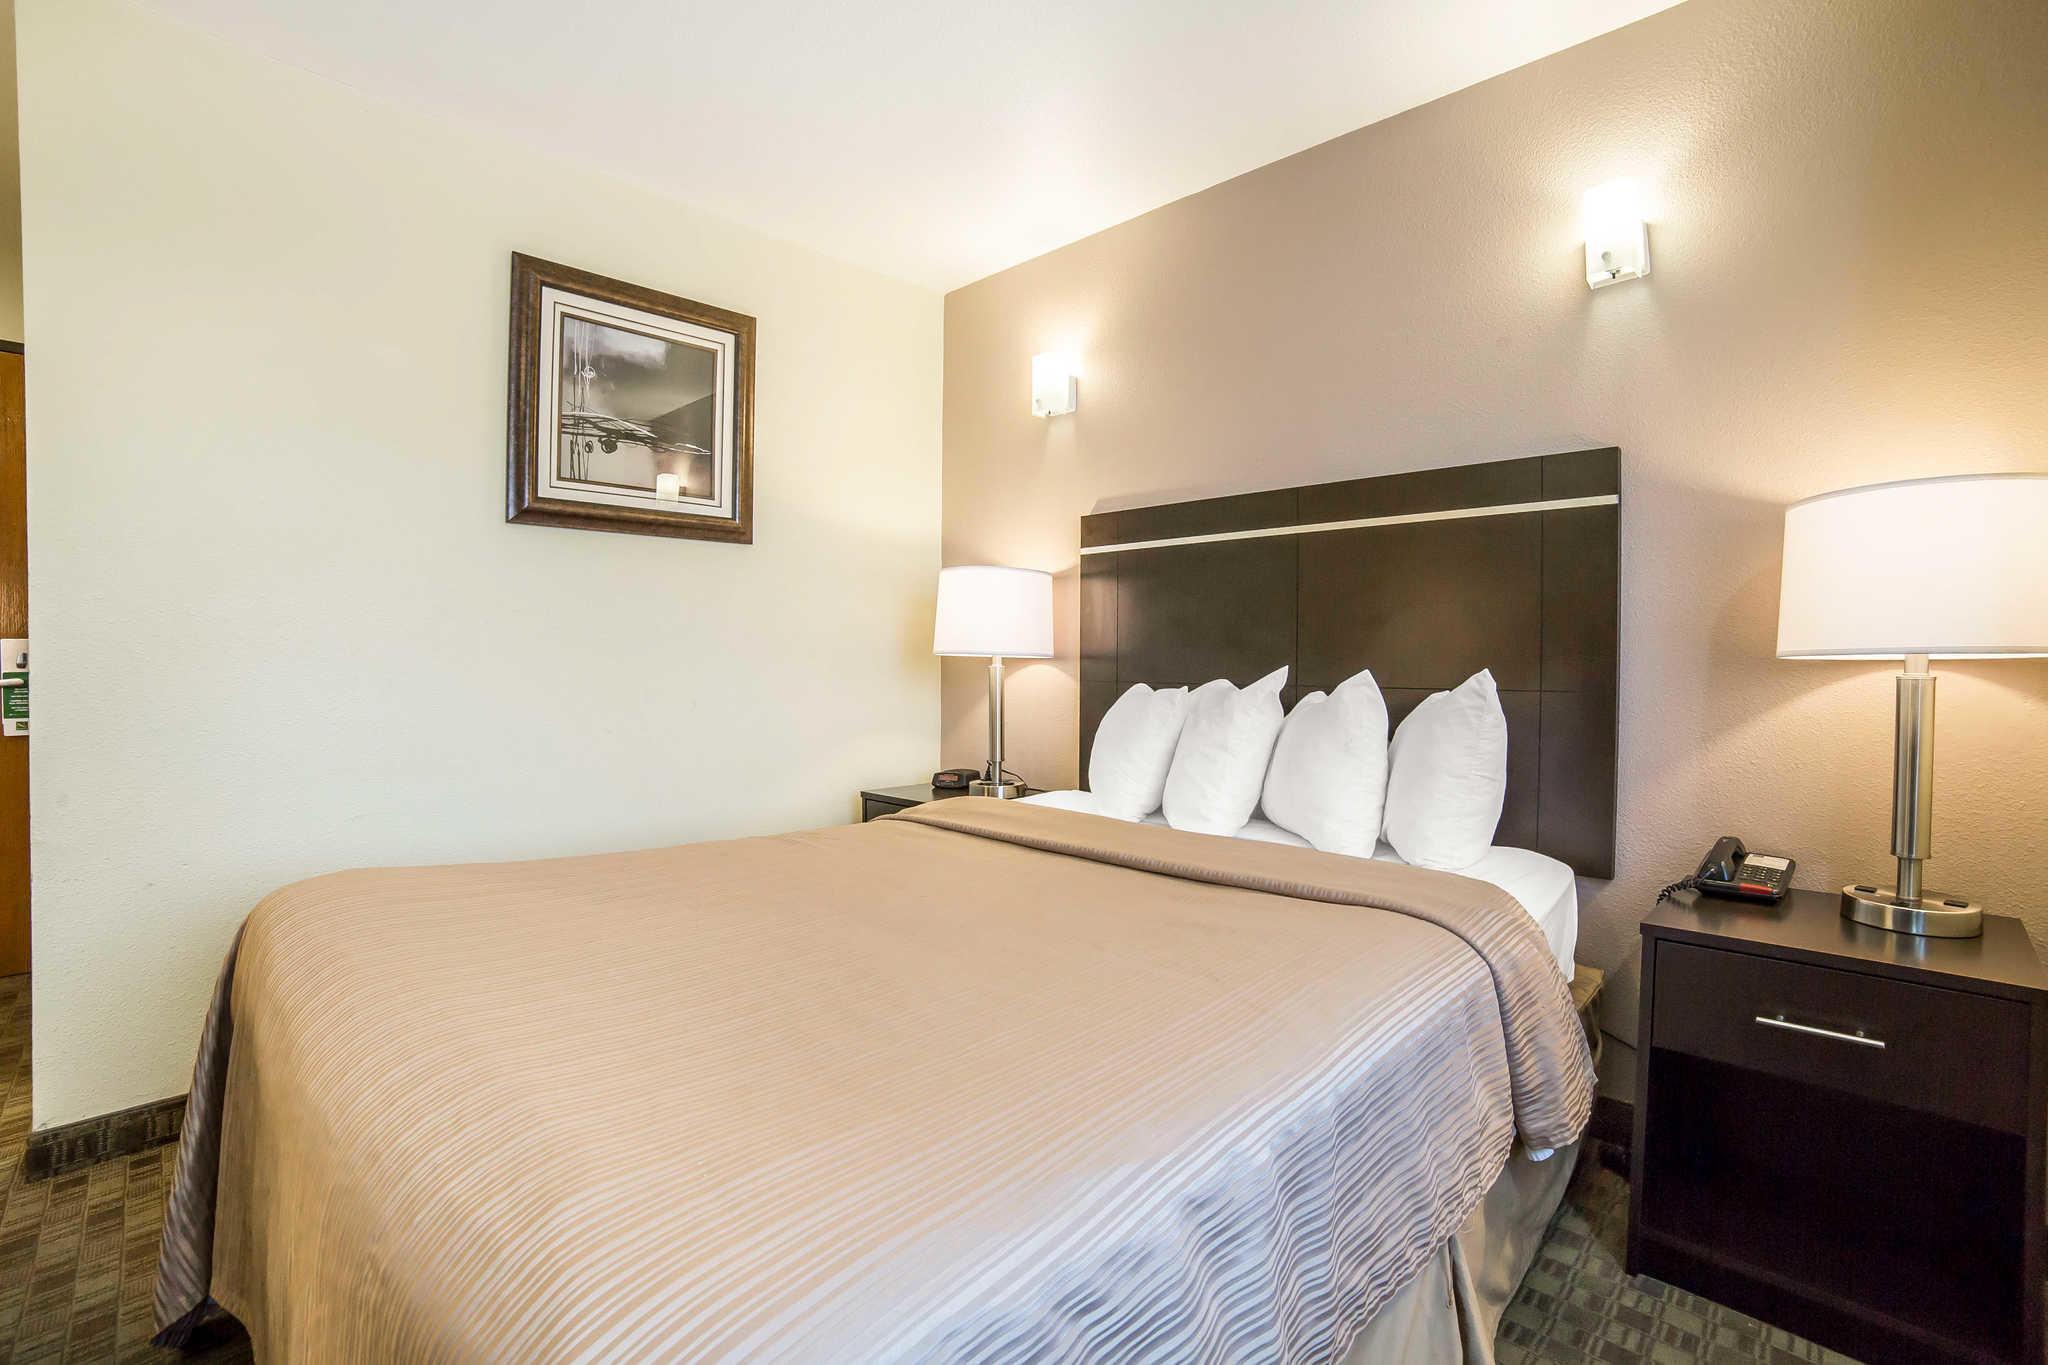 Quality Inn & Suites Elko image 3